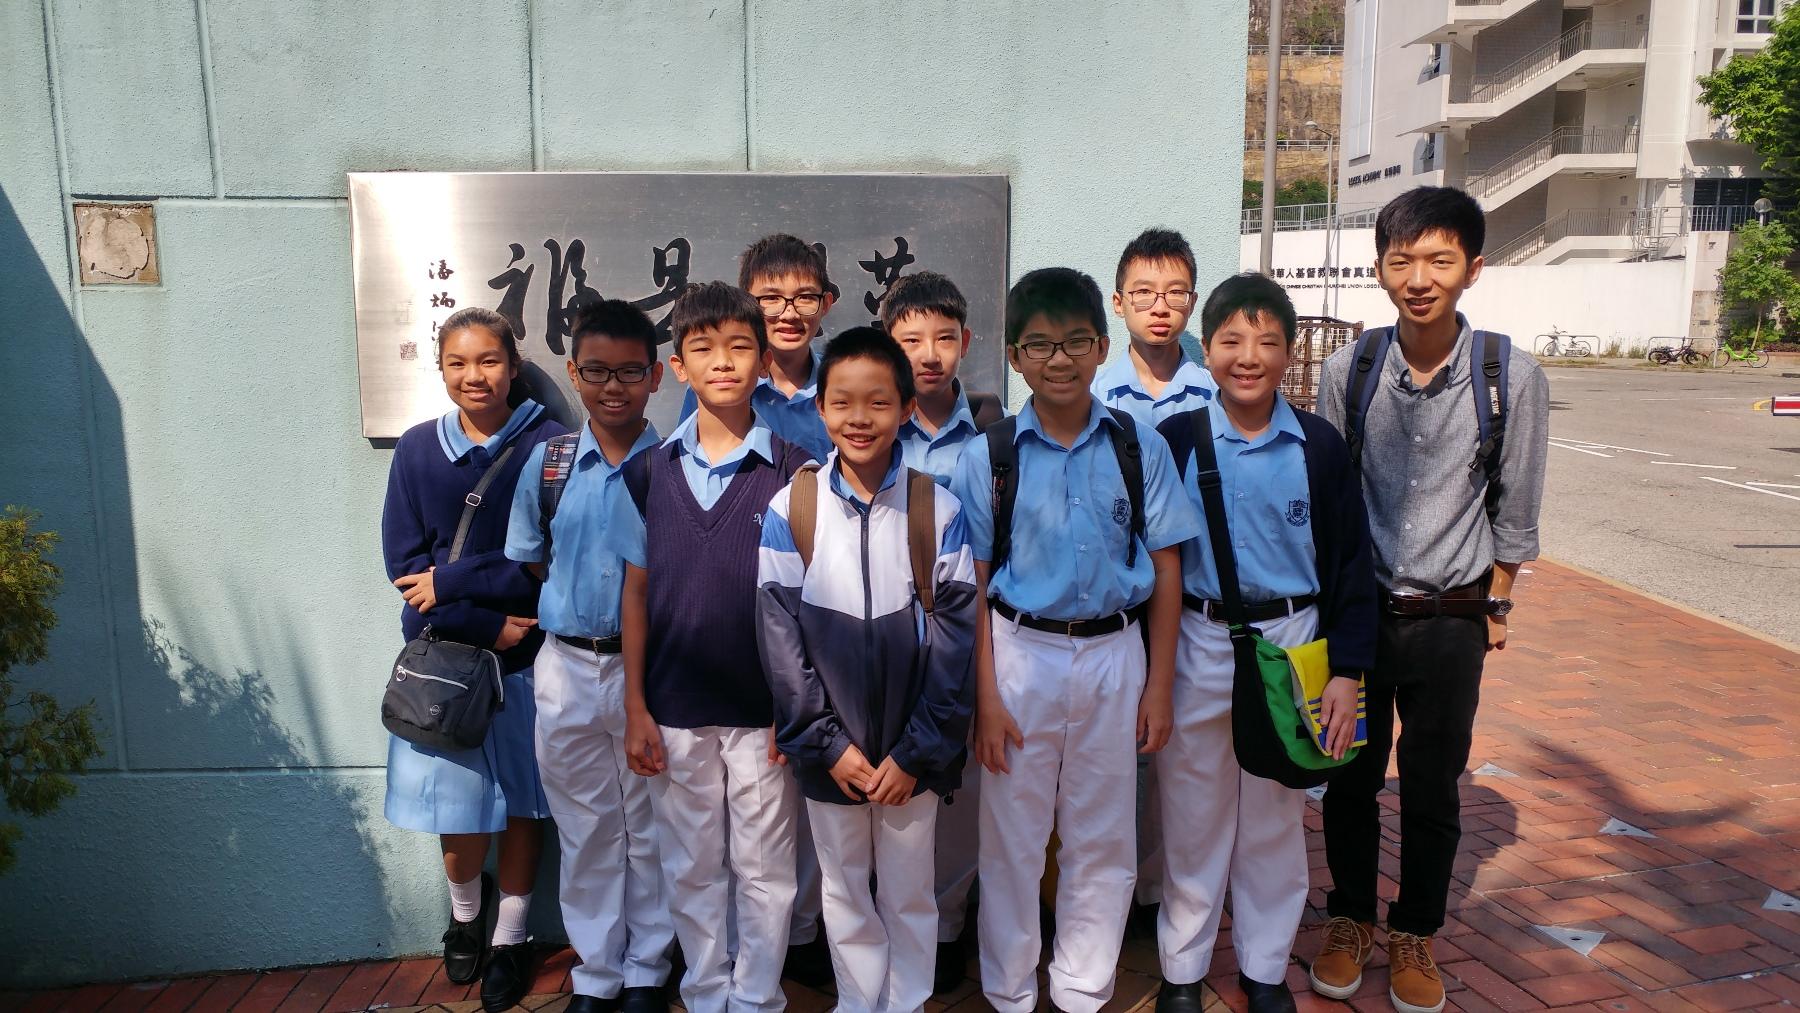 http://www.npc.edu.hk/sites/default/files/img1.jpg